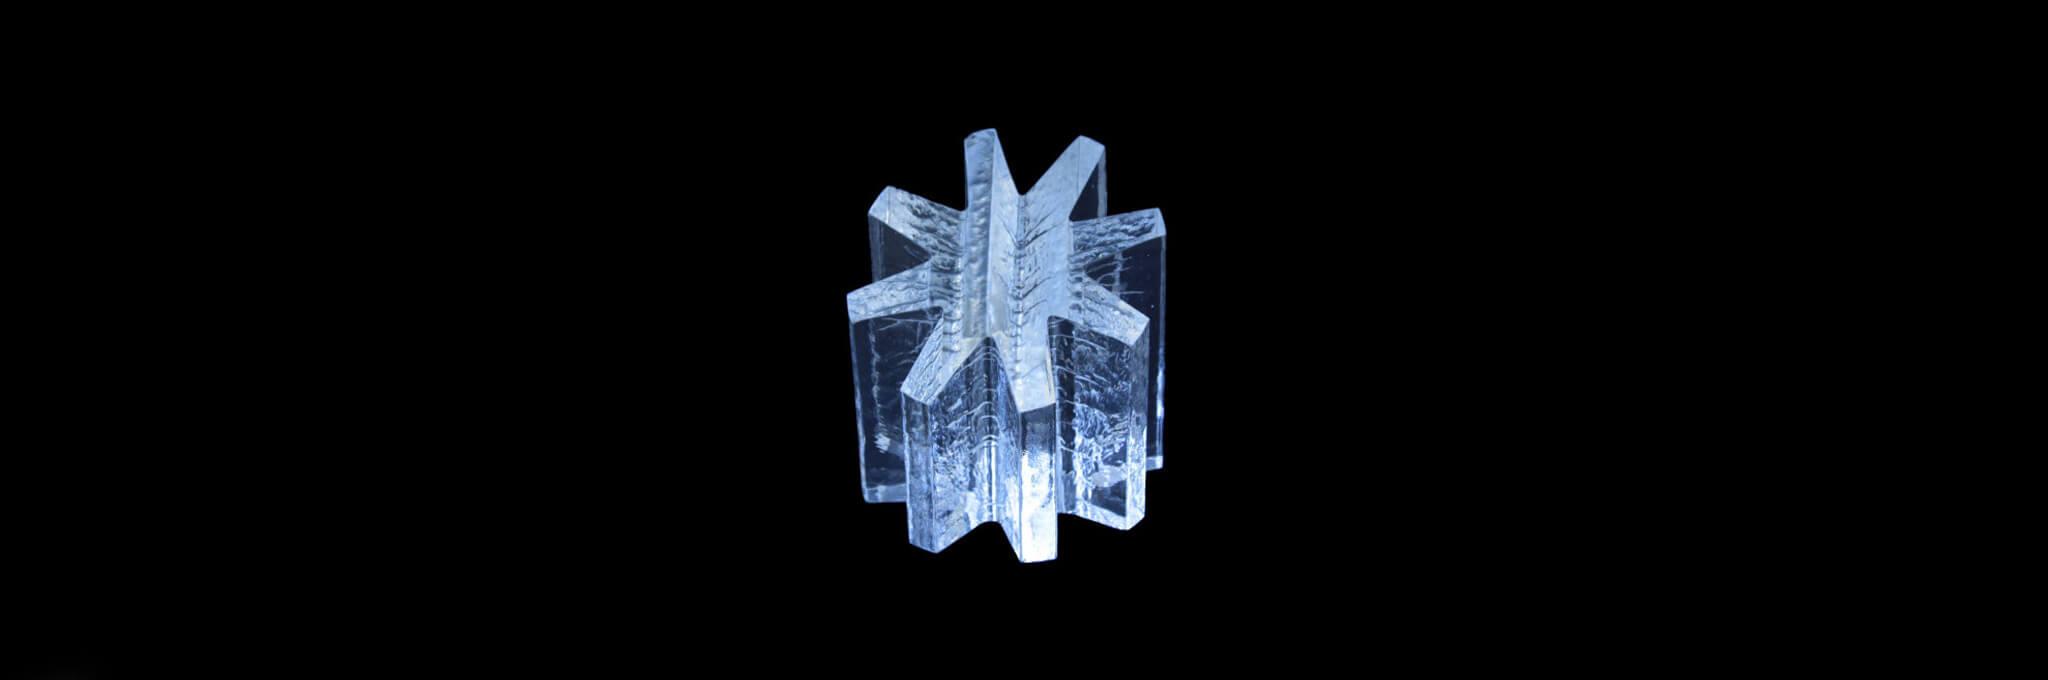 3D glass 8-pointed asterisk award sculpture